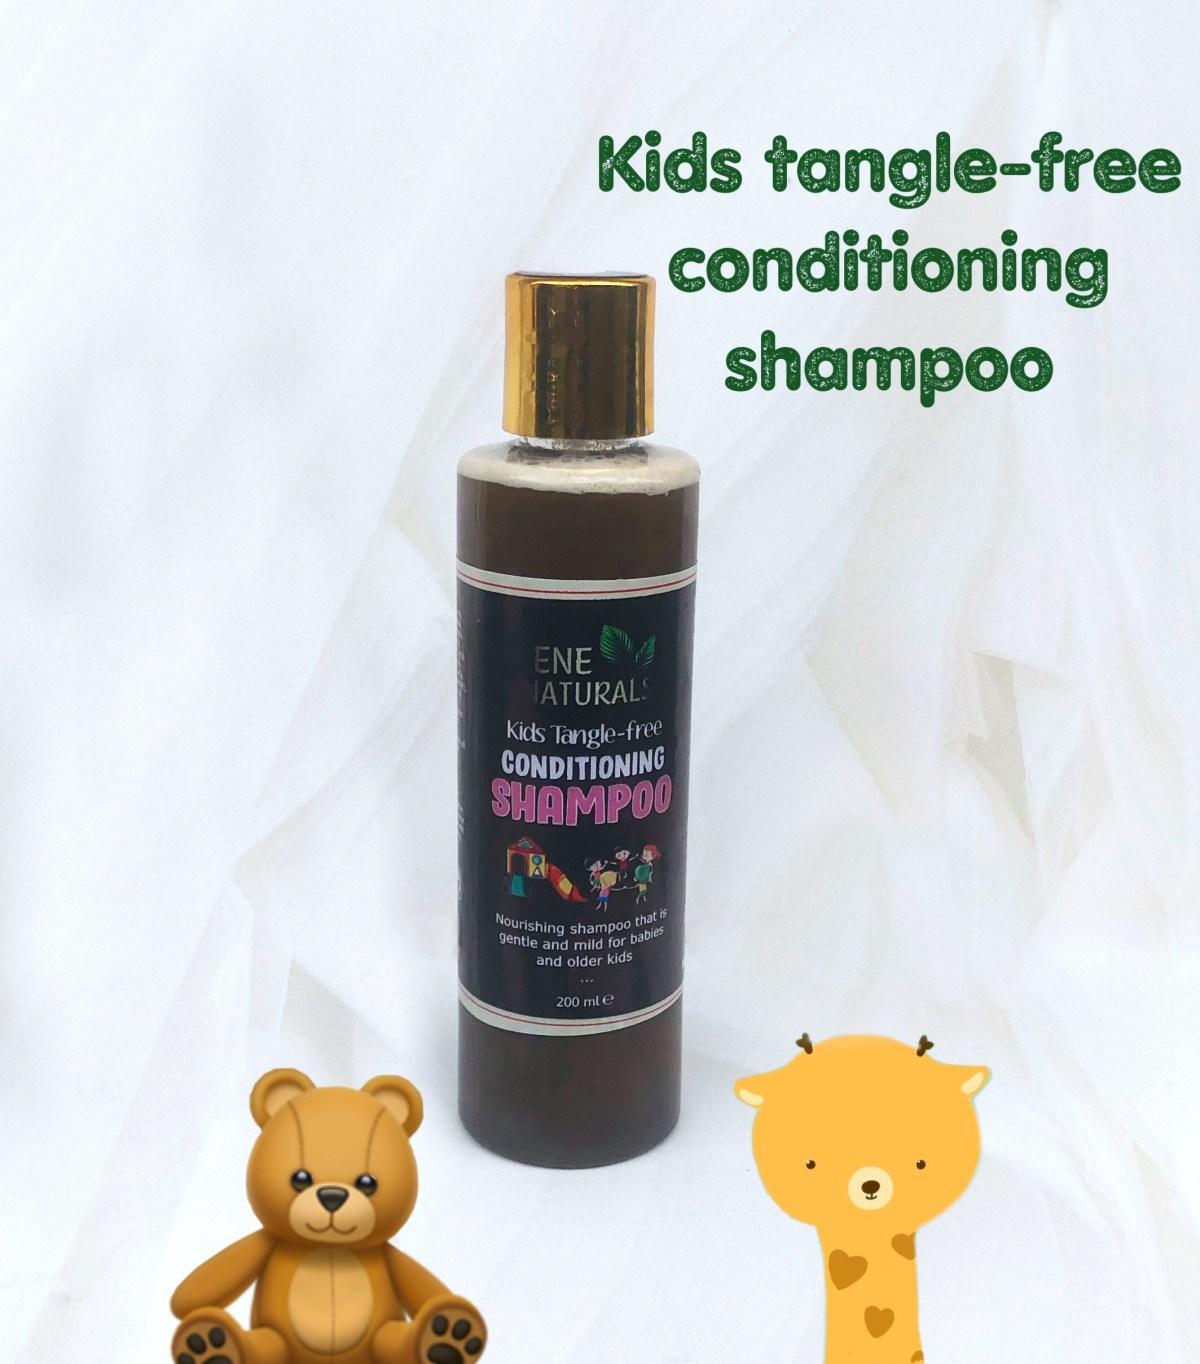 Kids tangle free conditioning shampoo